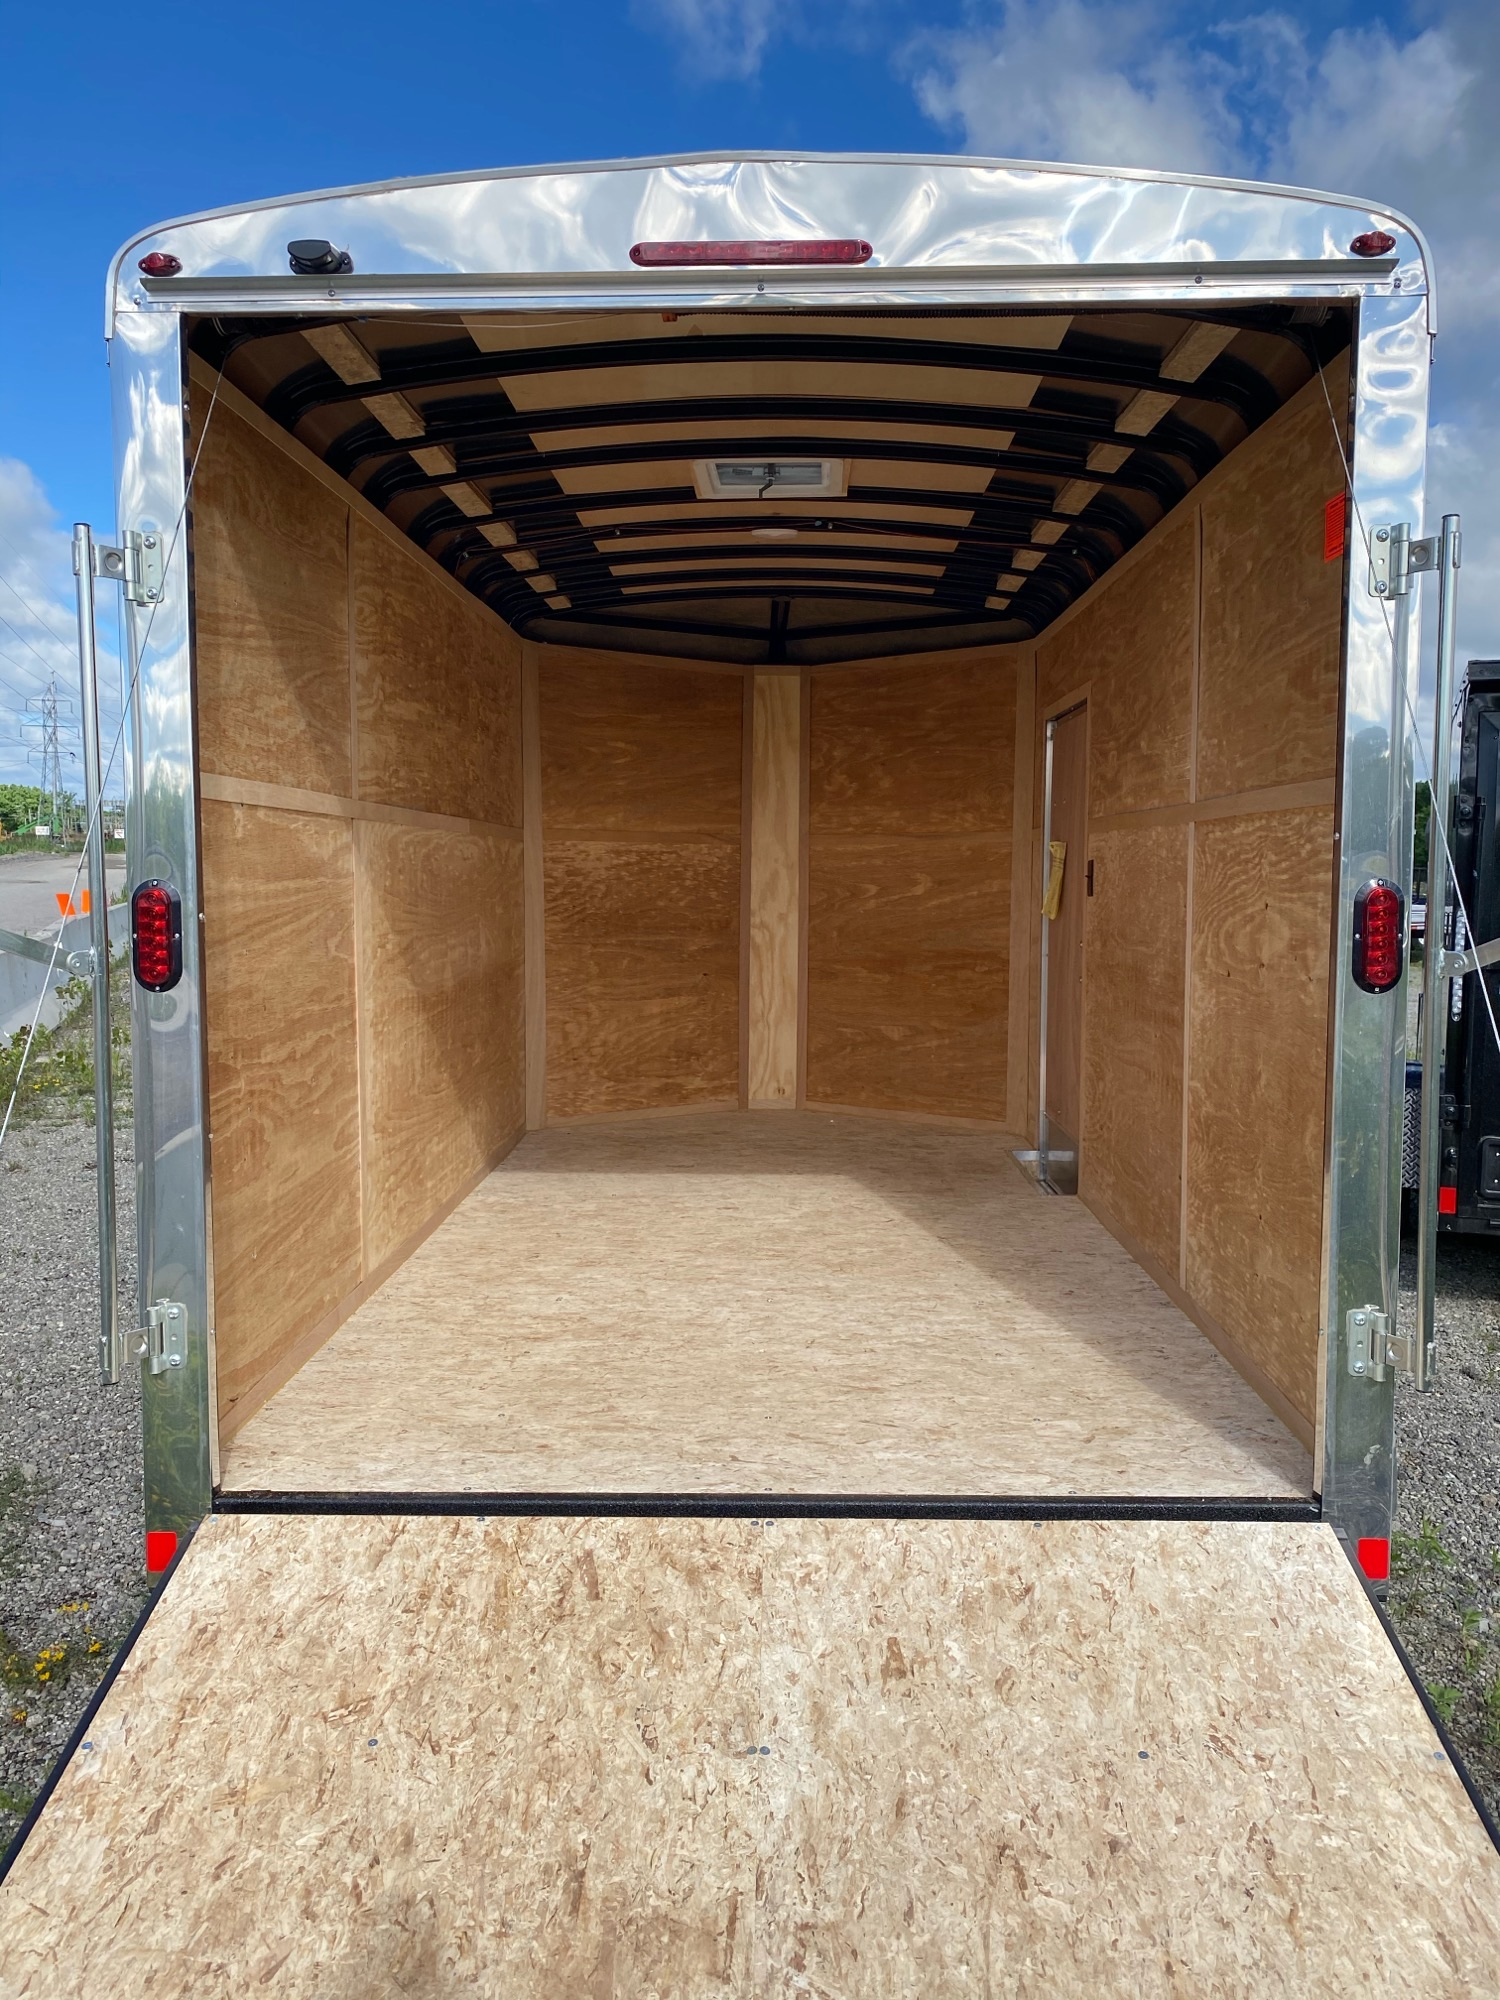 2020 Interstate 1 7X12 Enclosed Cargo Trailer